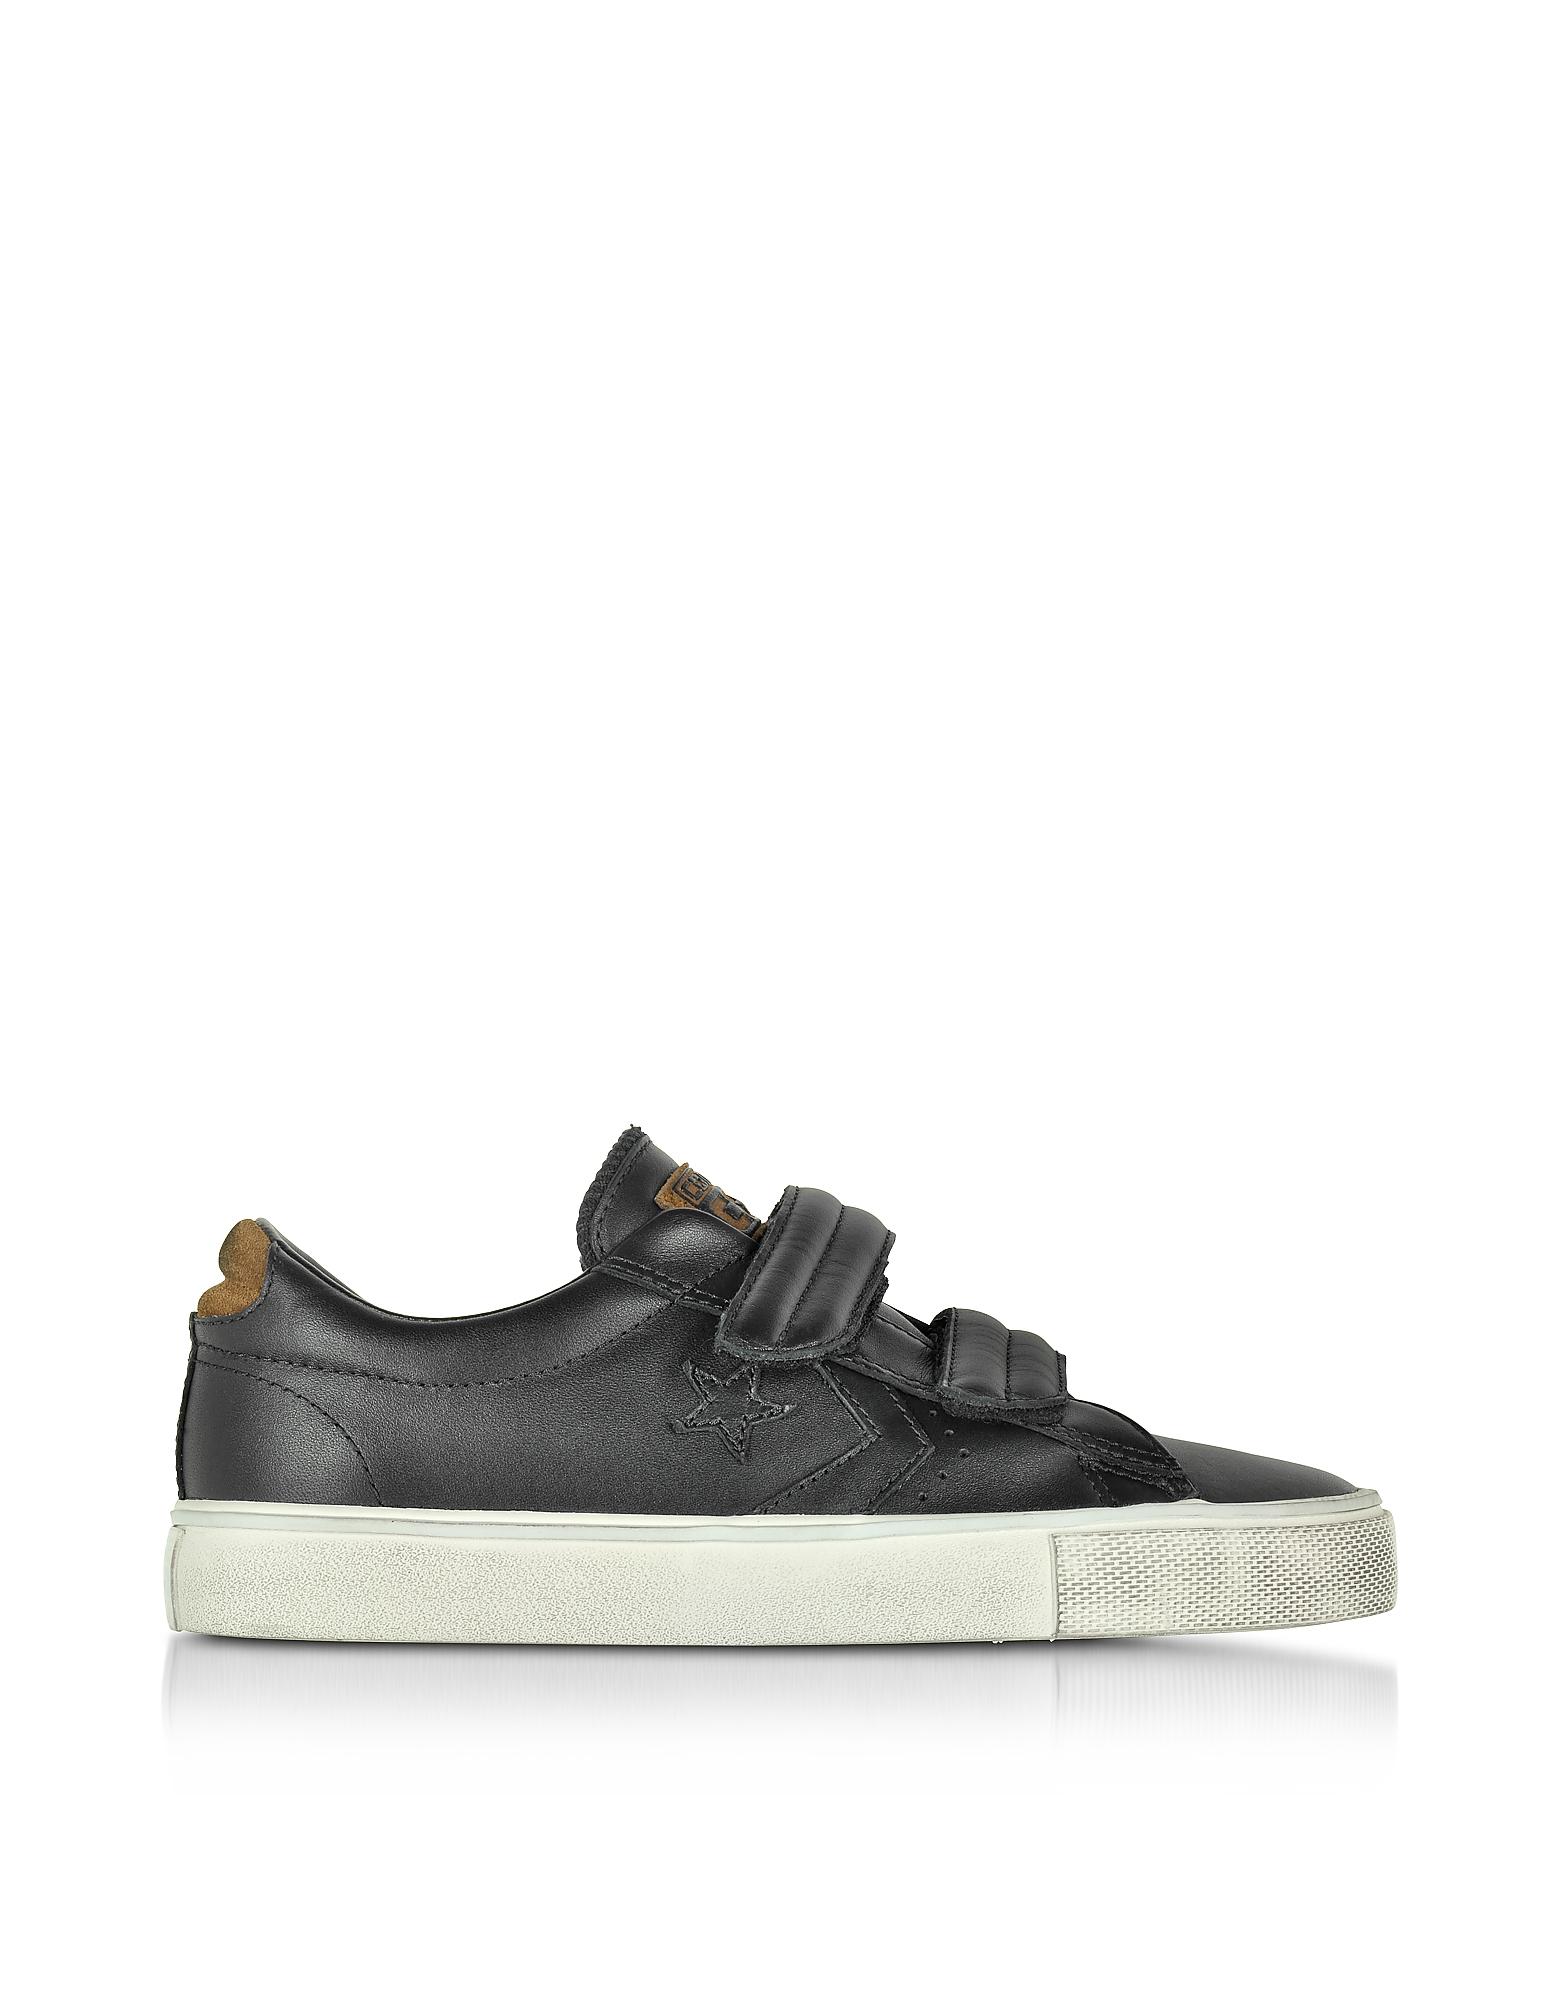 Lyst - Converse Pro Leather Vulc Black Strap Unisex Sneaker in Black 6dfaf91cc1e0